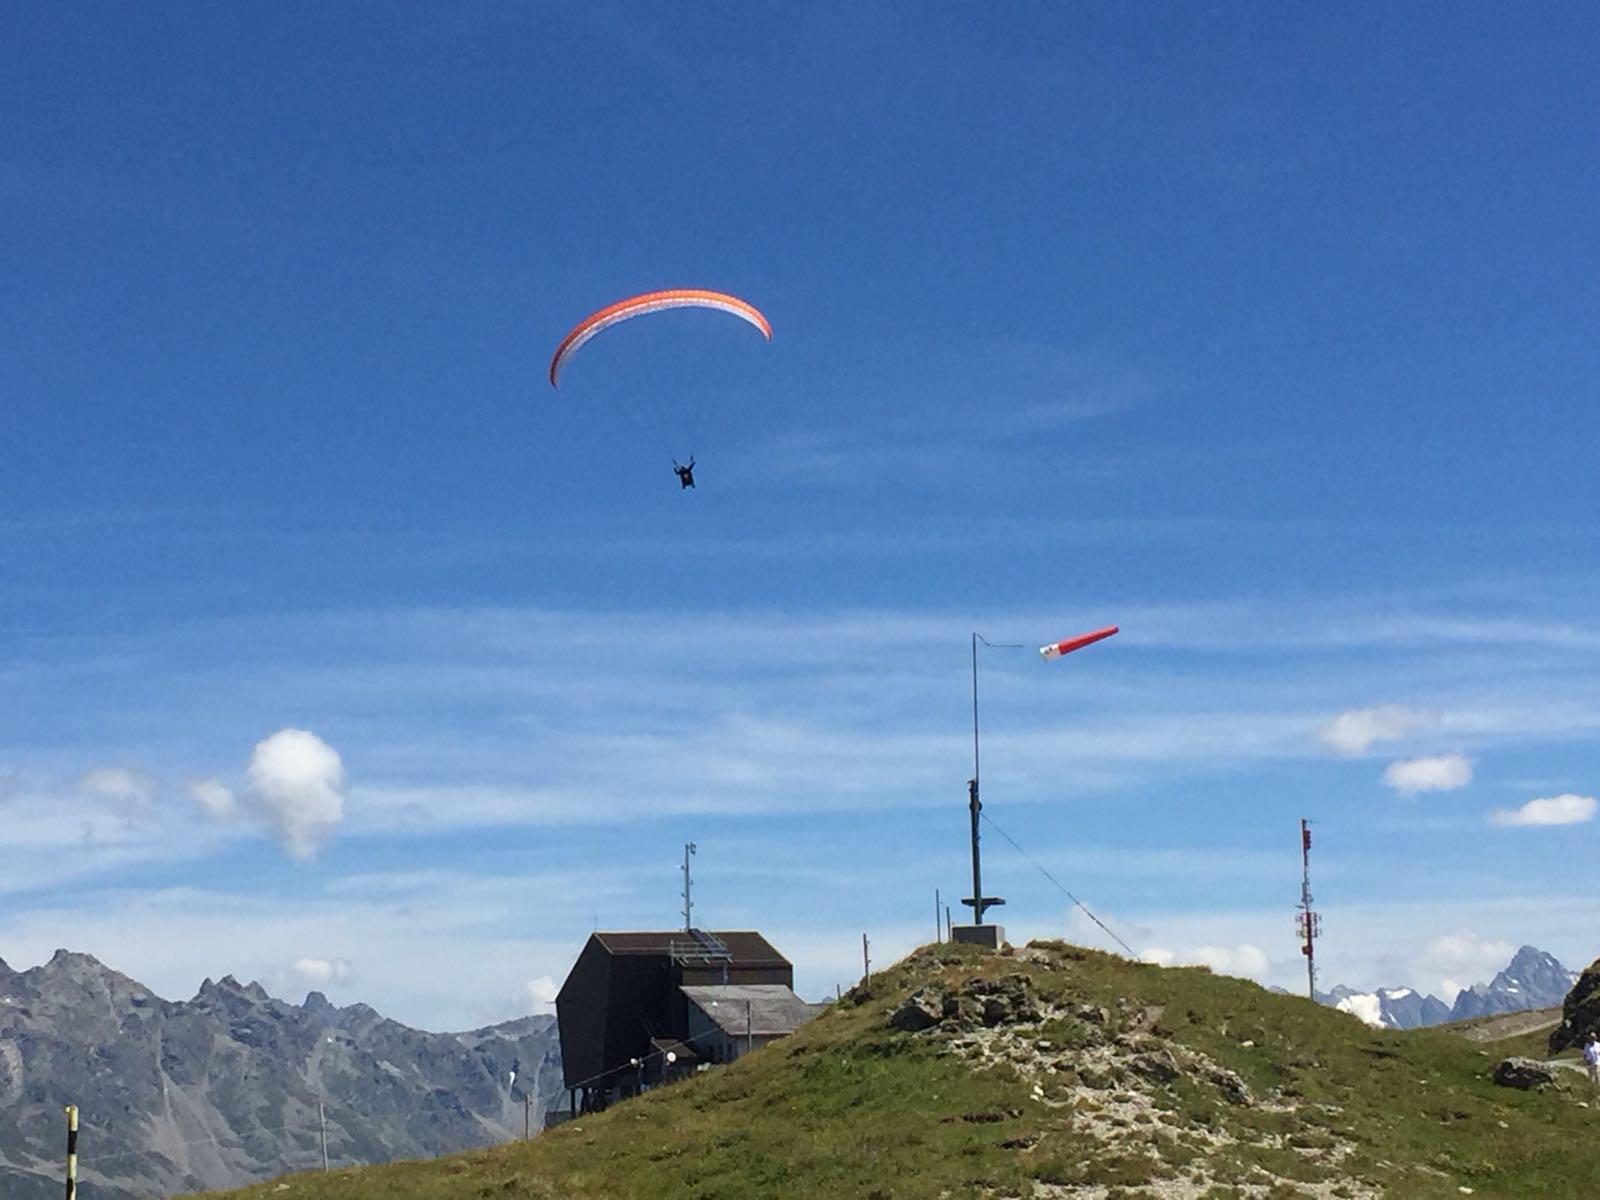 Flugtage Klosters